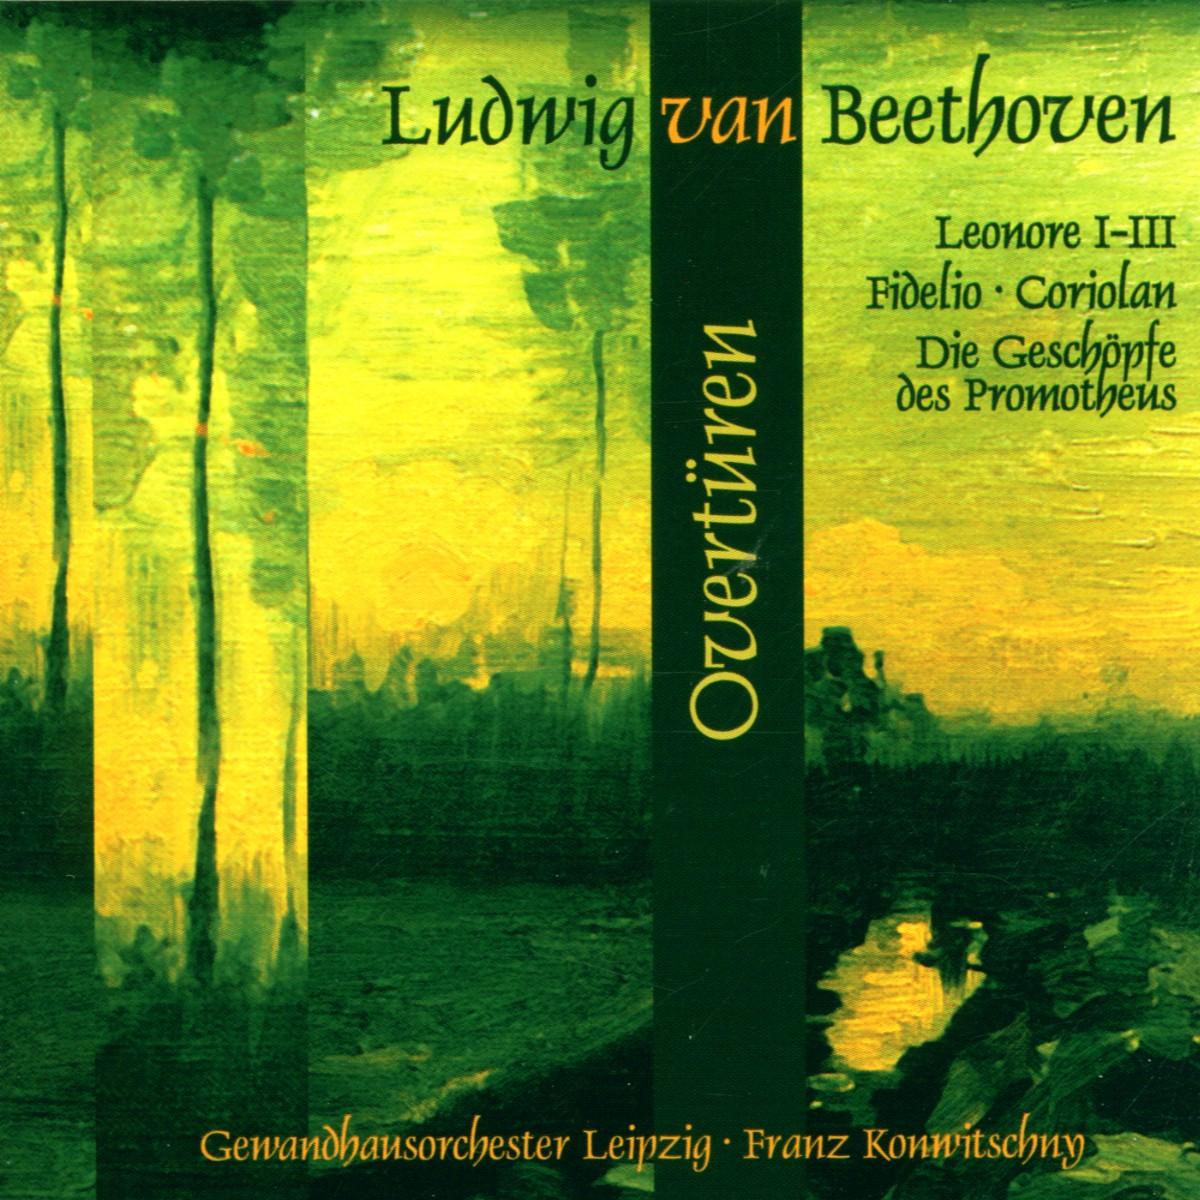 Leonoren-Ouvertüre; Fidelio, Prometheus